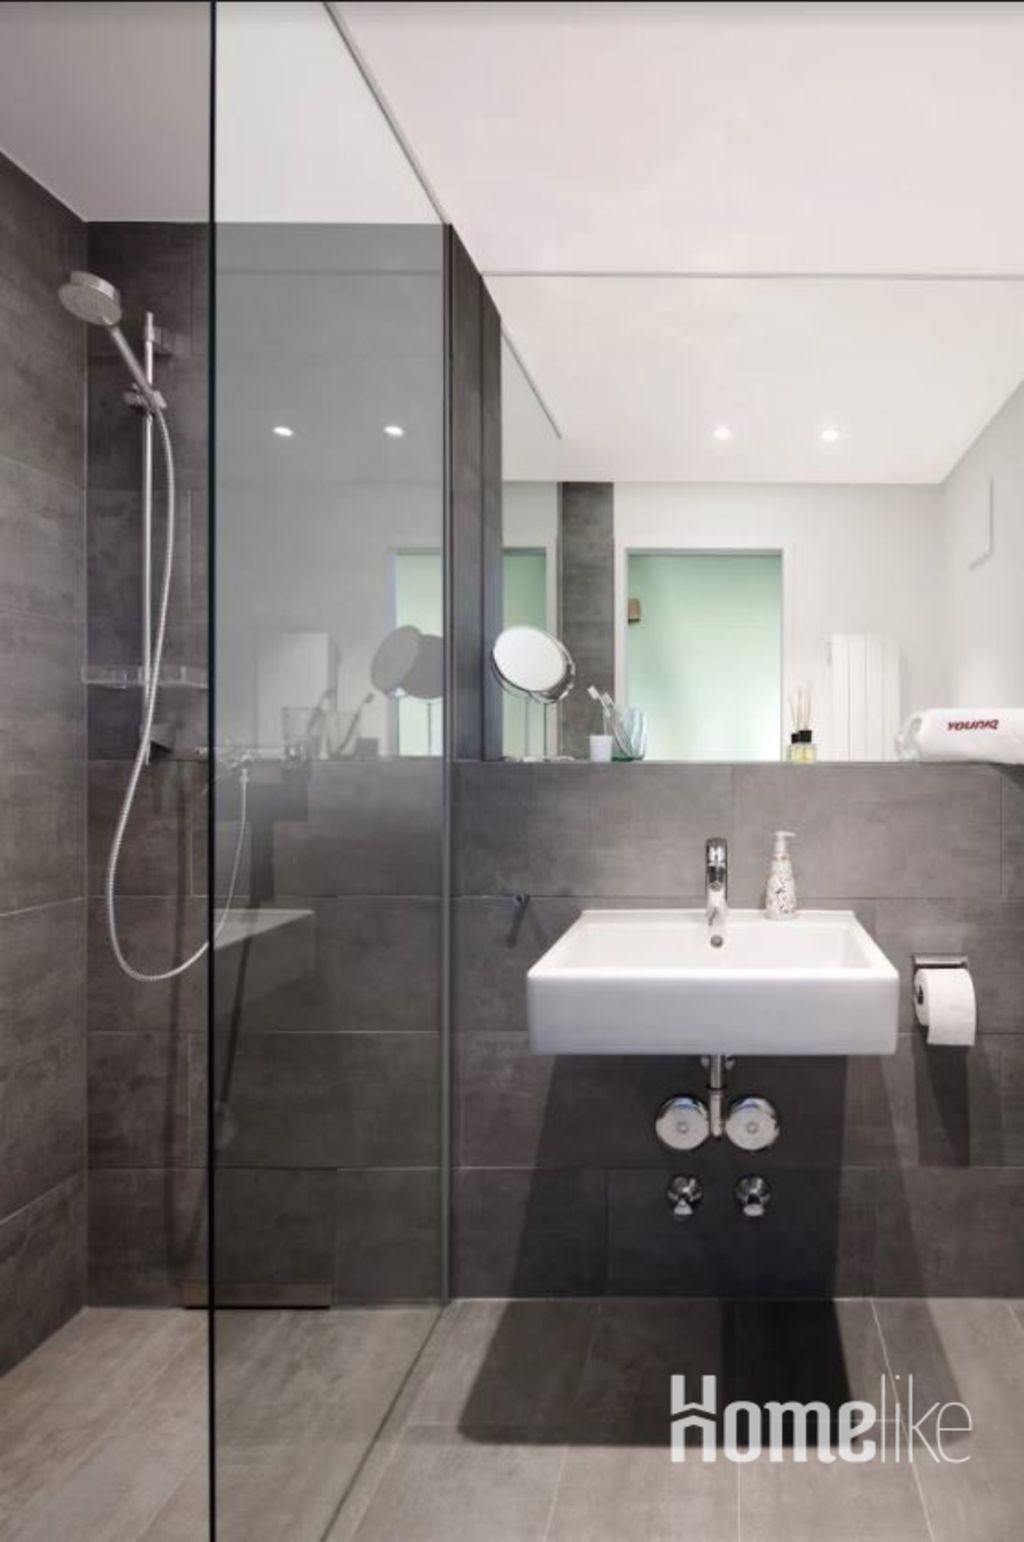 image 5 furnished 1 bedroom Apartment for rent in Altstadt, Frankfurt